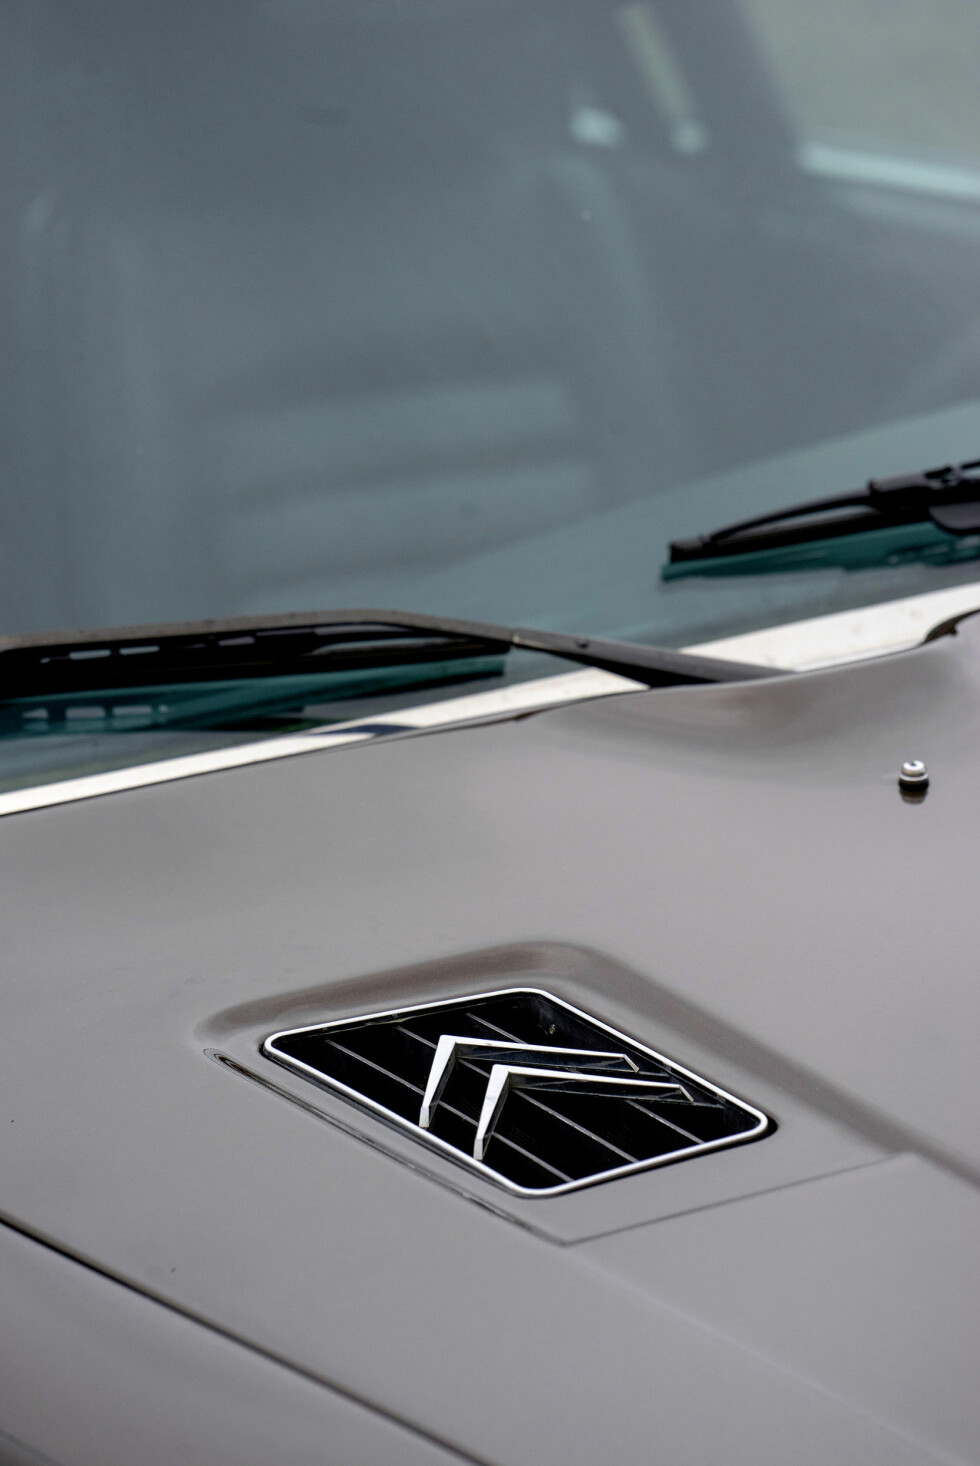 TANNHJUL: Elegang branding på panseret. Citroëns logo skal symbolisere et tannhjul. Foto: Paal Kvamme